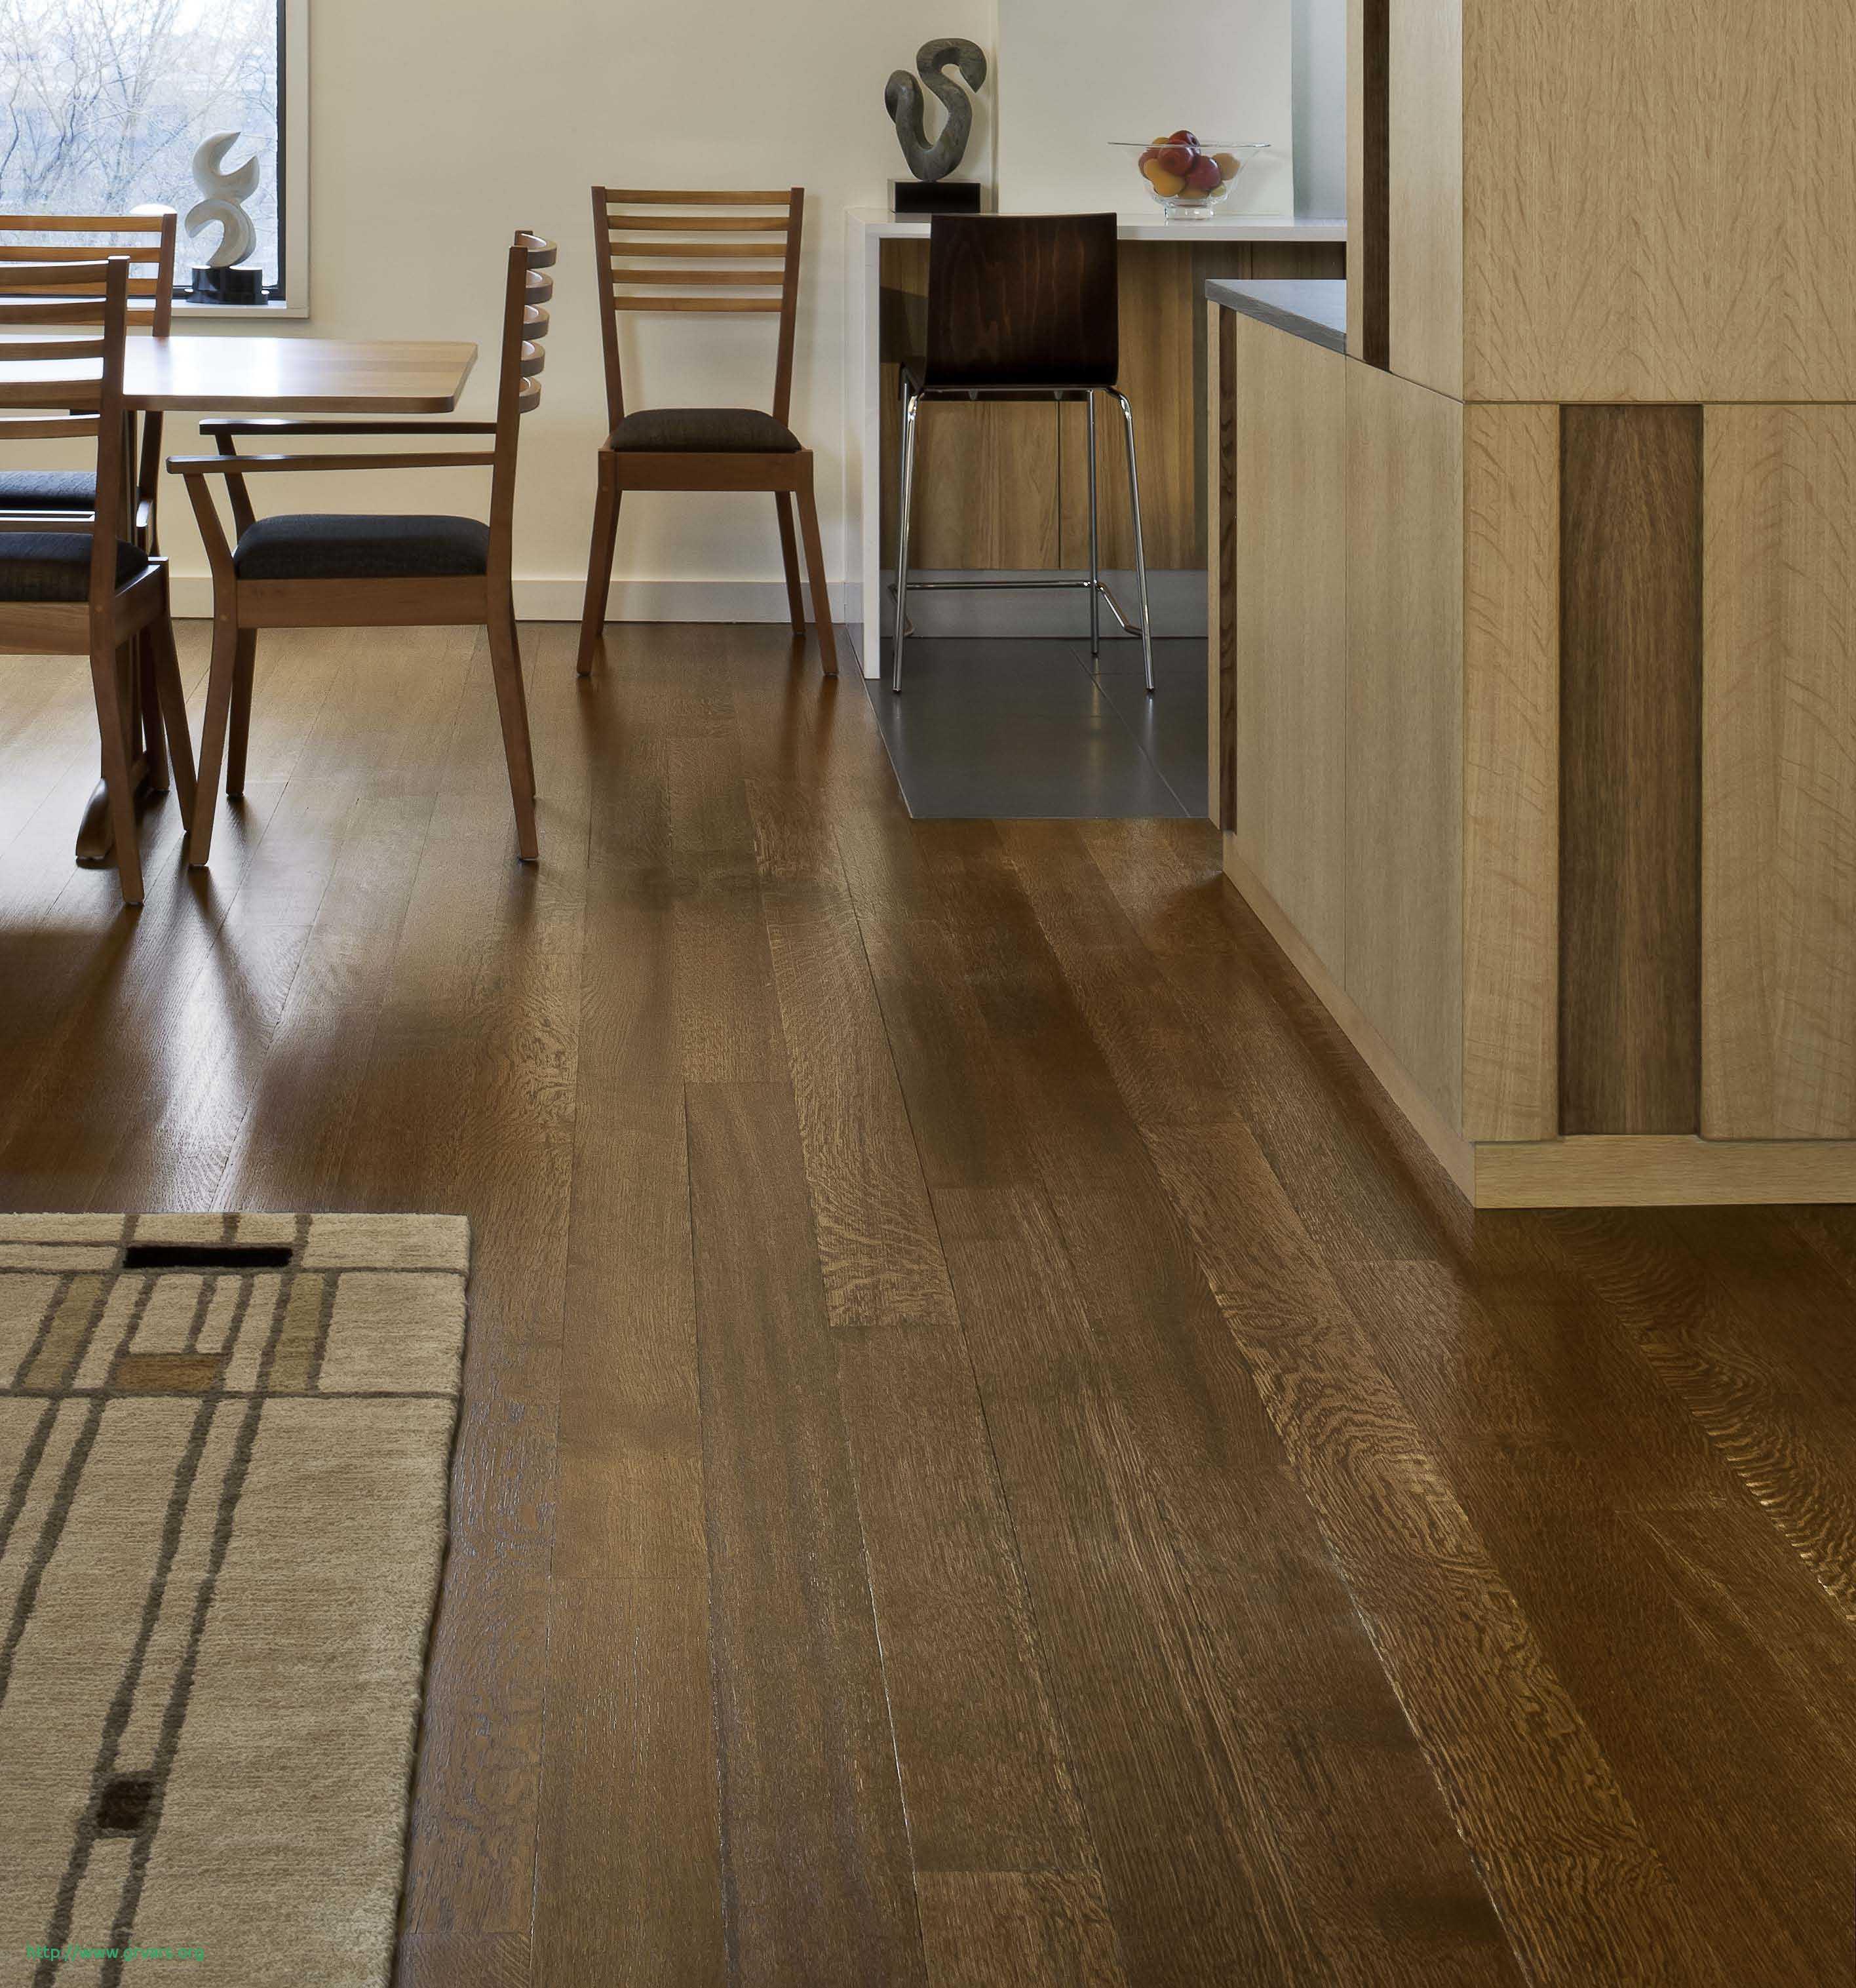 red oak hardwood flooring sale of 16 impressionnant bruce flooring customer service ideas blog within bruce flooring customer service inspirant engaging discount hardwood flooring 5 where to buy inspirational 0d